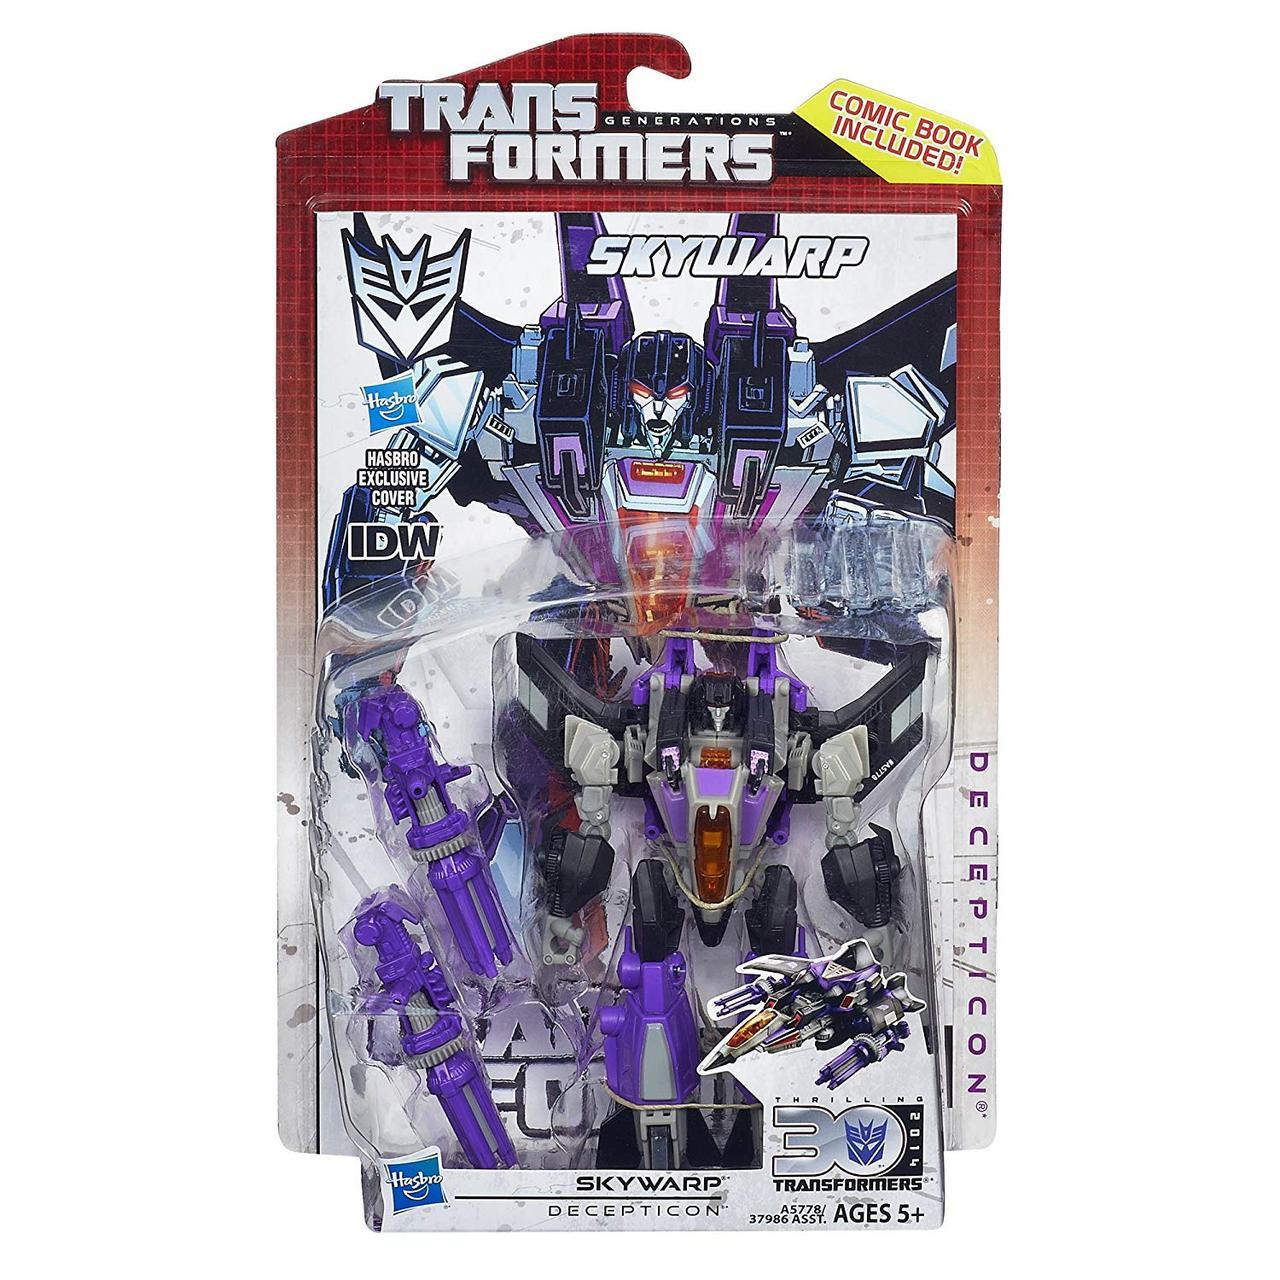 Трансформер-десептикон Скайварп - Skywarp, Deluxe Class, 30th Transformers, Generations, Hasbro